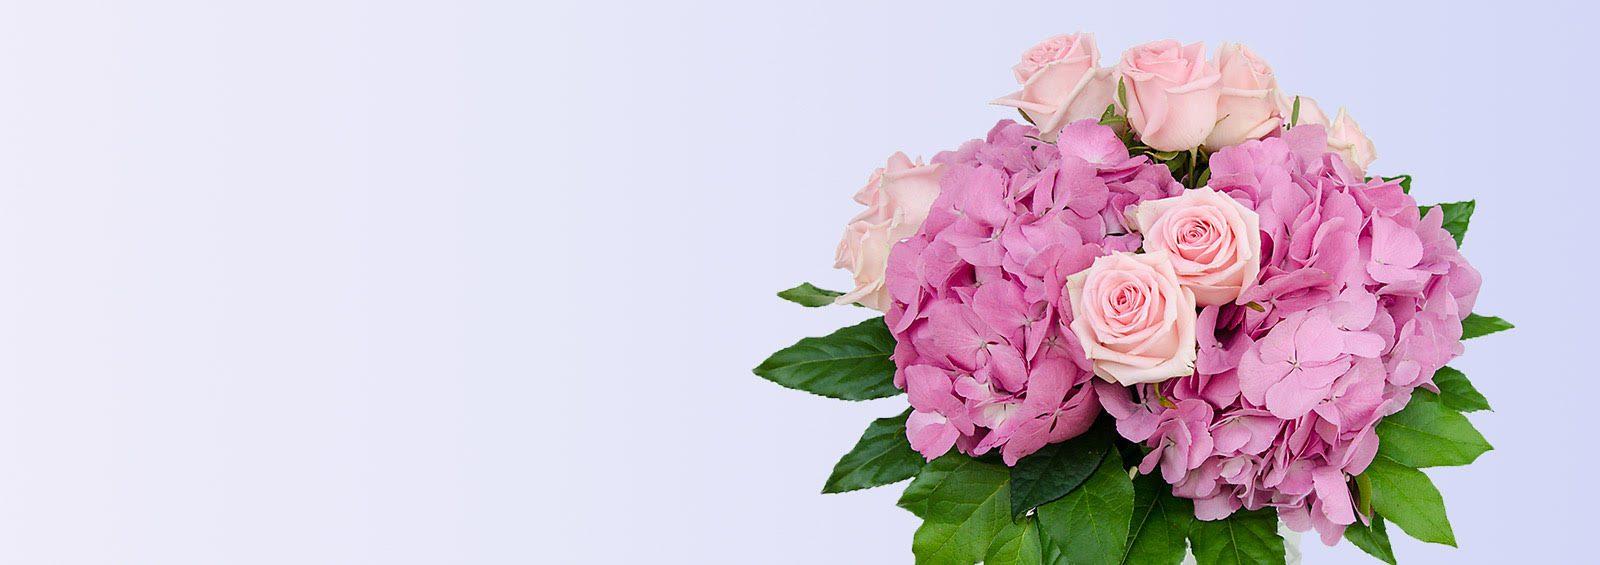 Accueil , Fleurs Kammerer, Maîtres Artisans Fleuristes